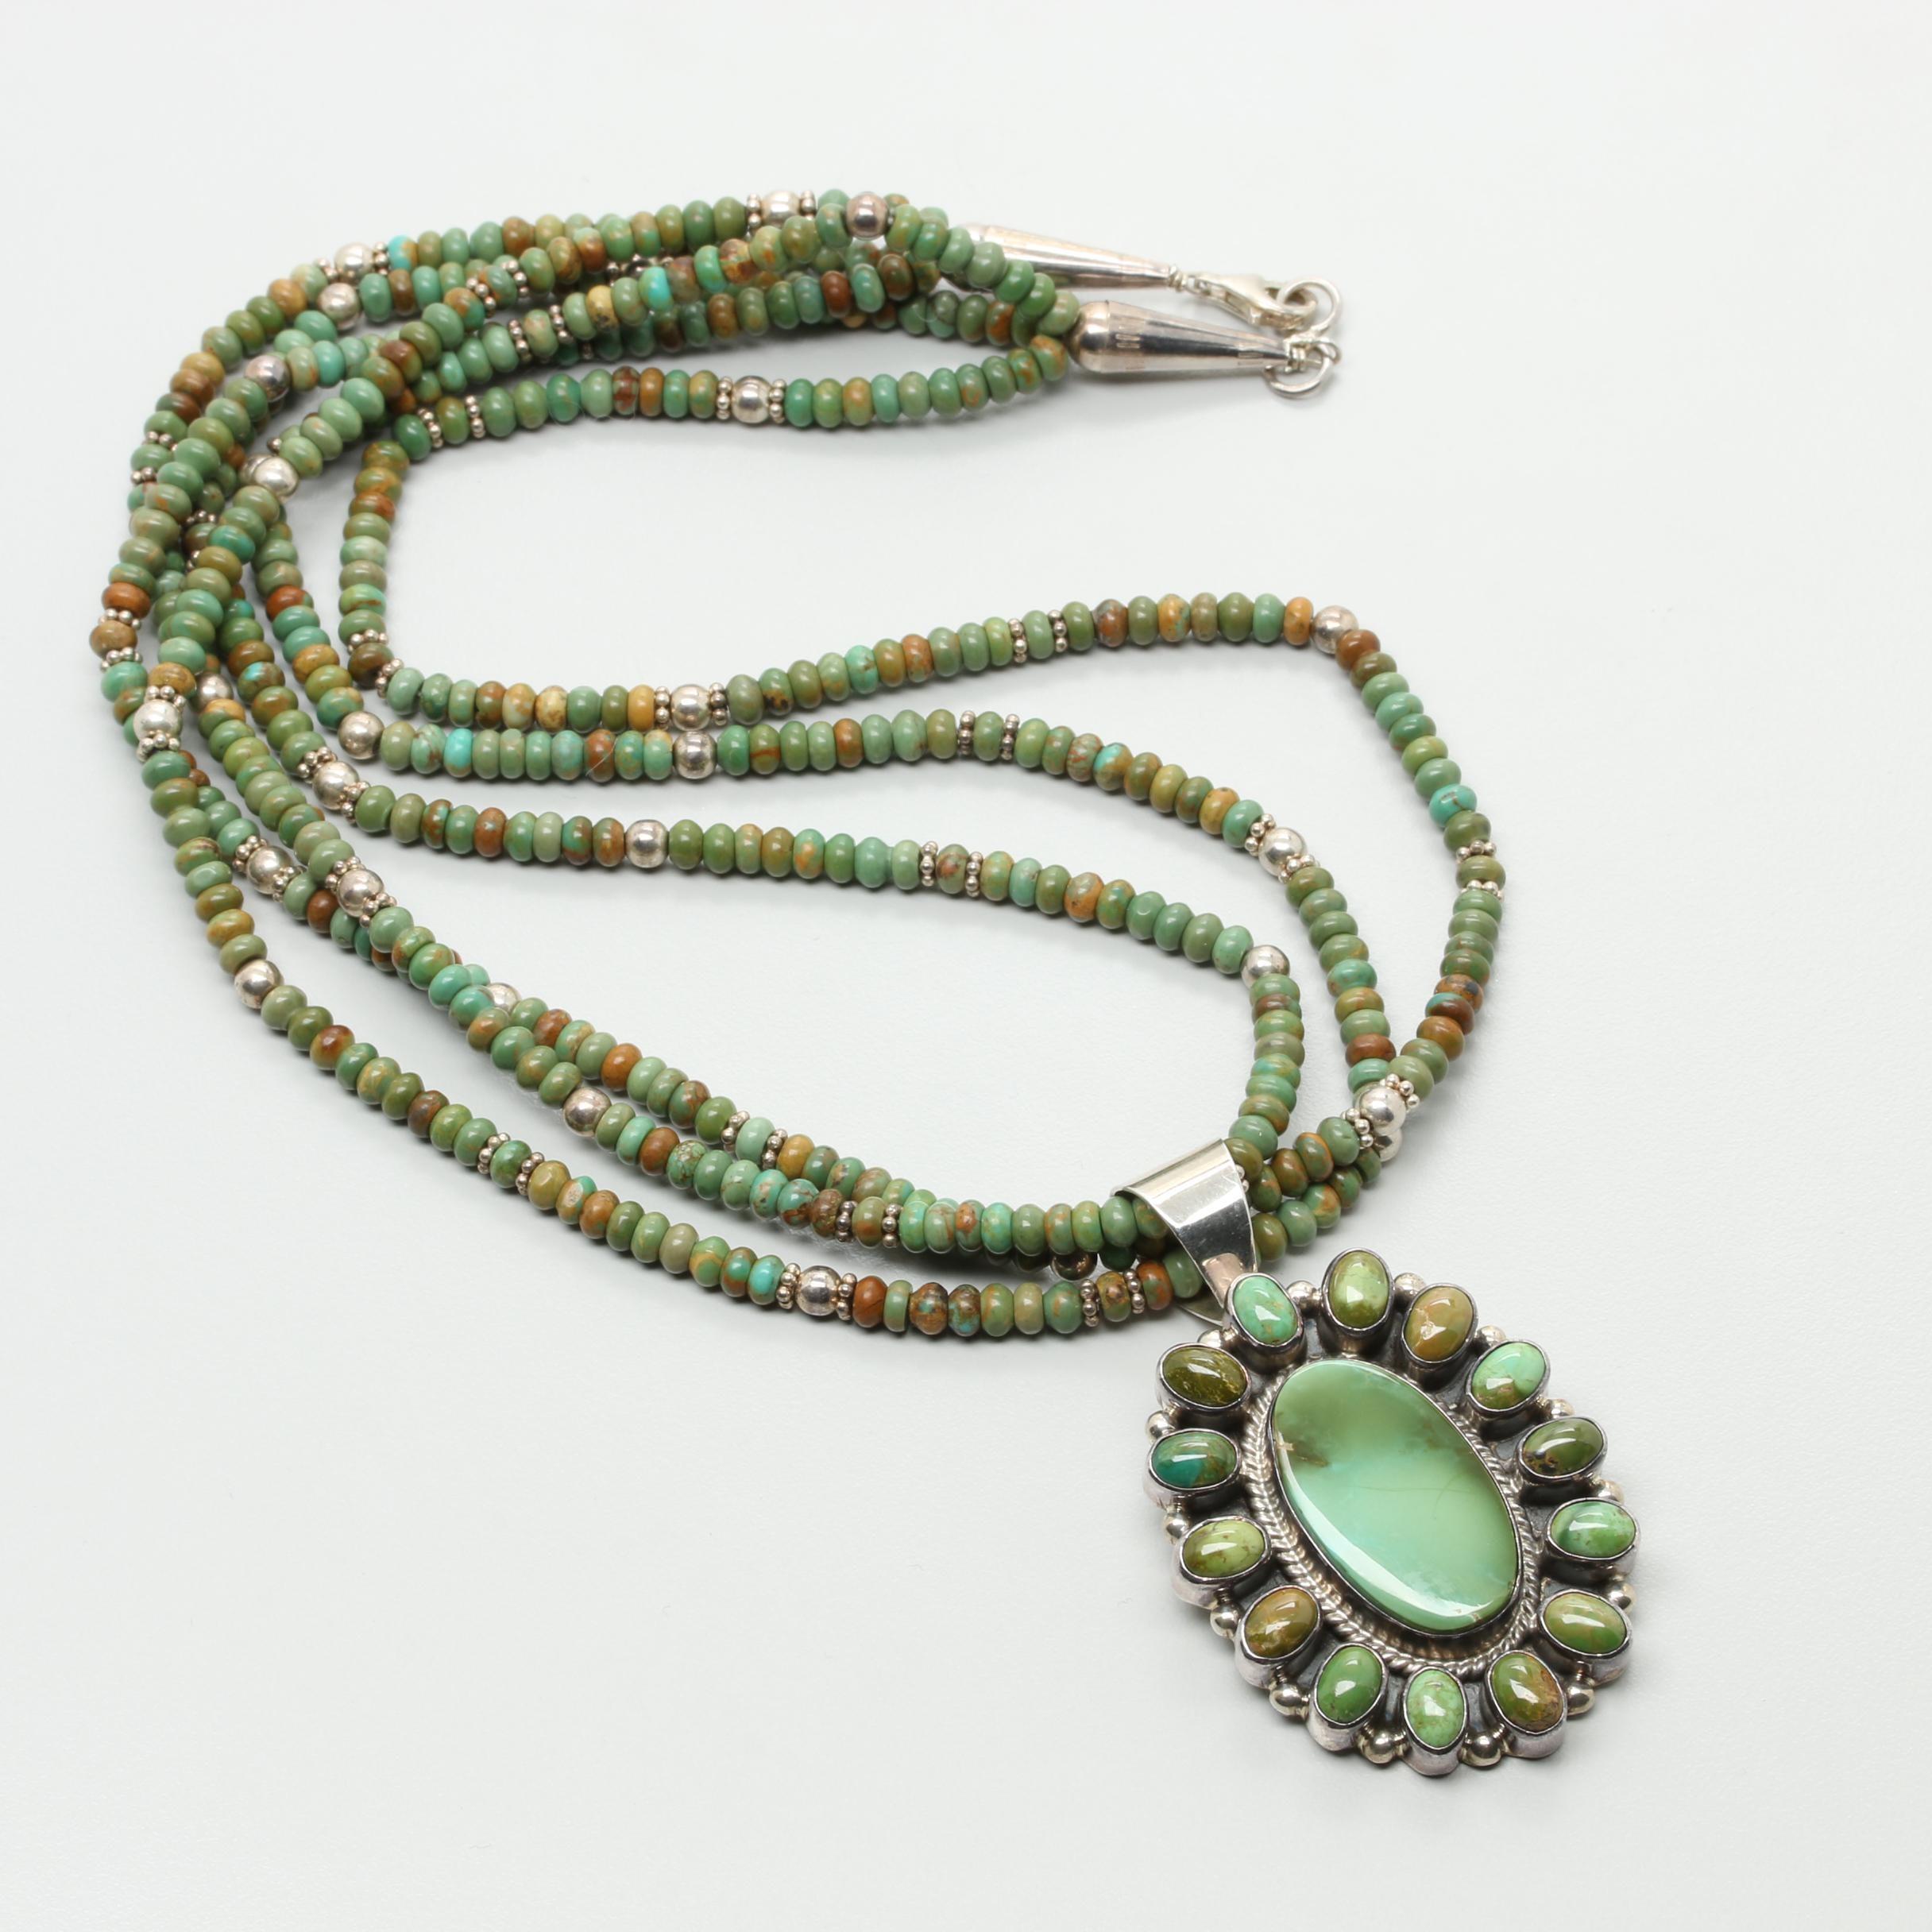 Sharon Hustito Zuni Sterling Silver Turquoise Pendant Necklace